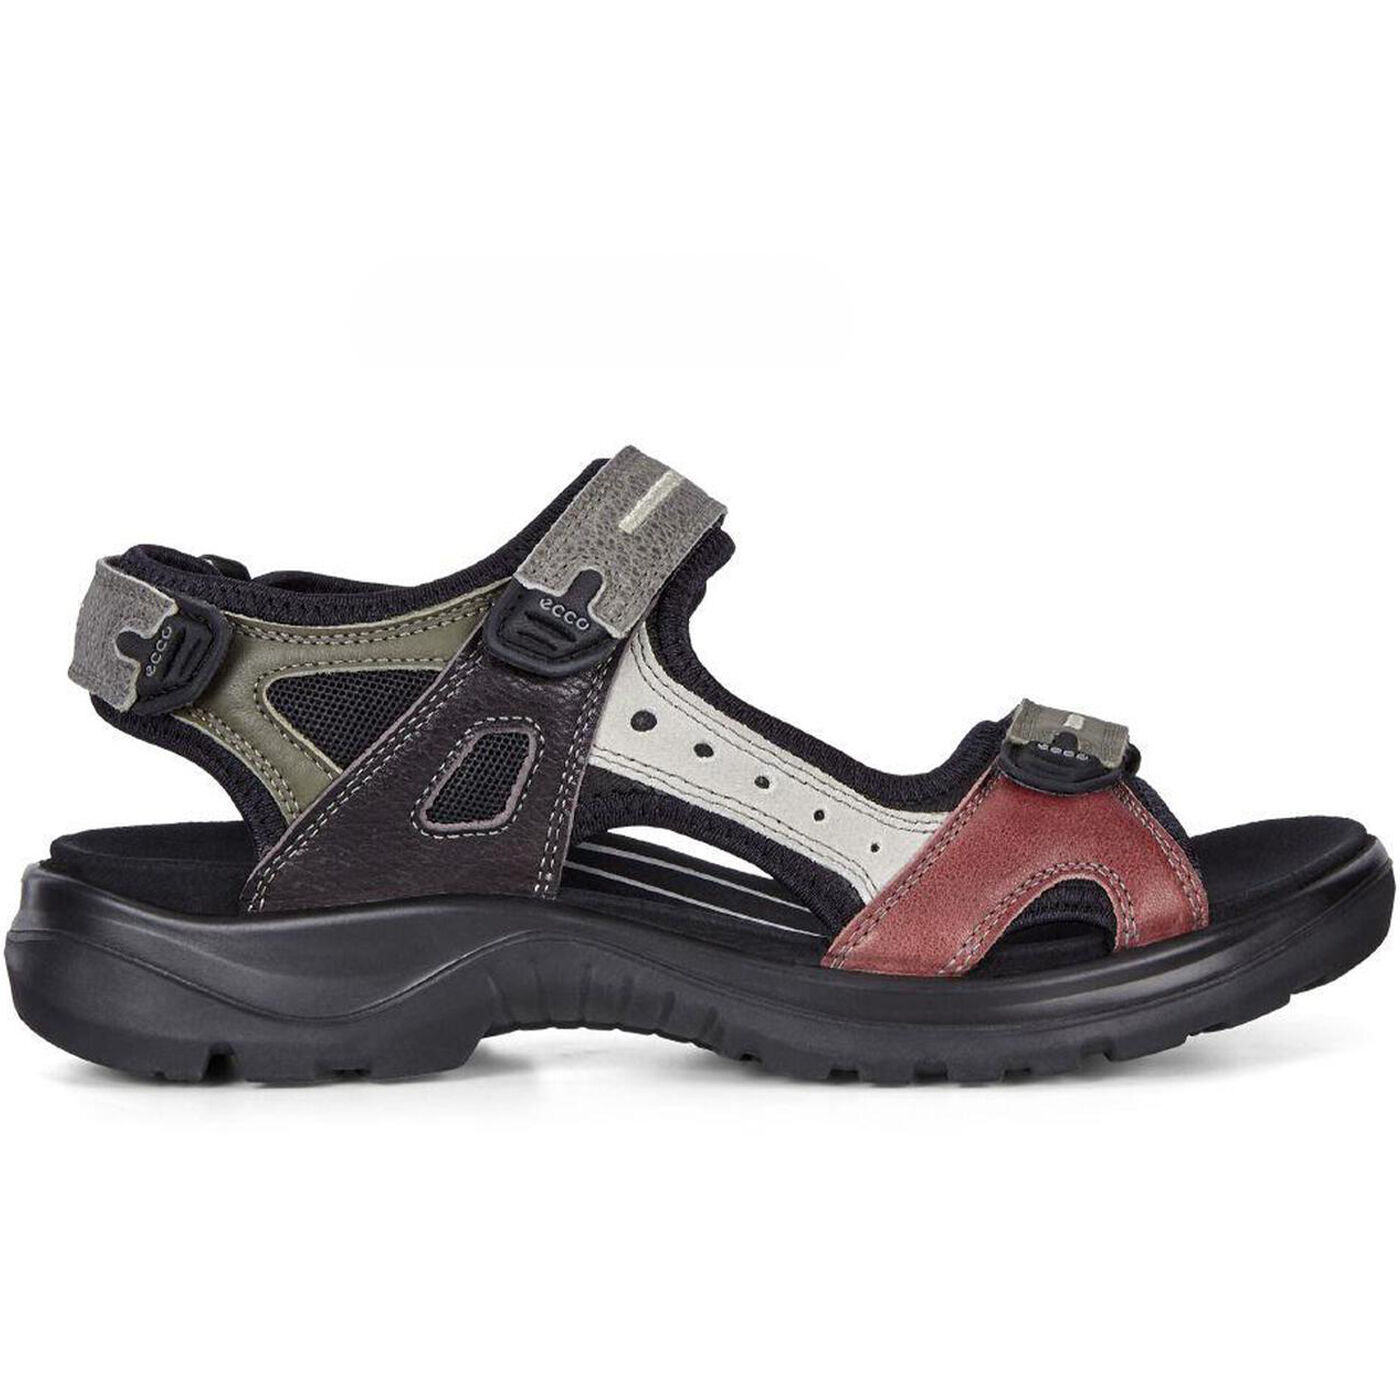 ecco womens sandals sale